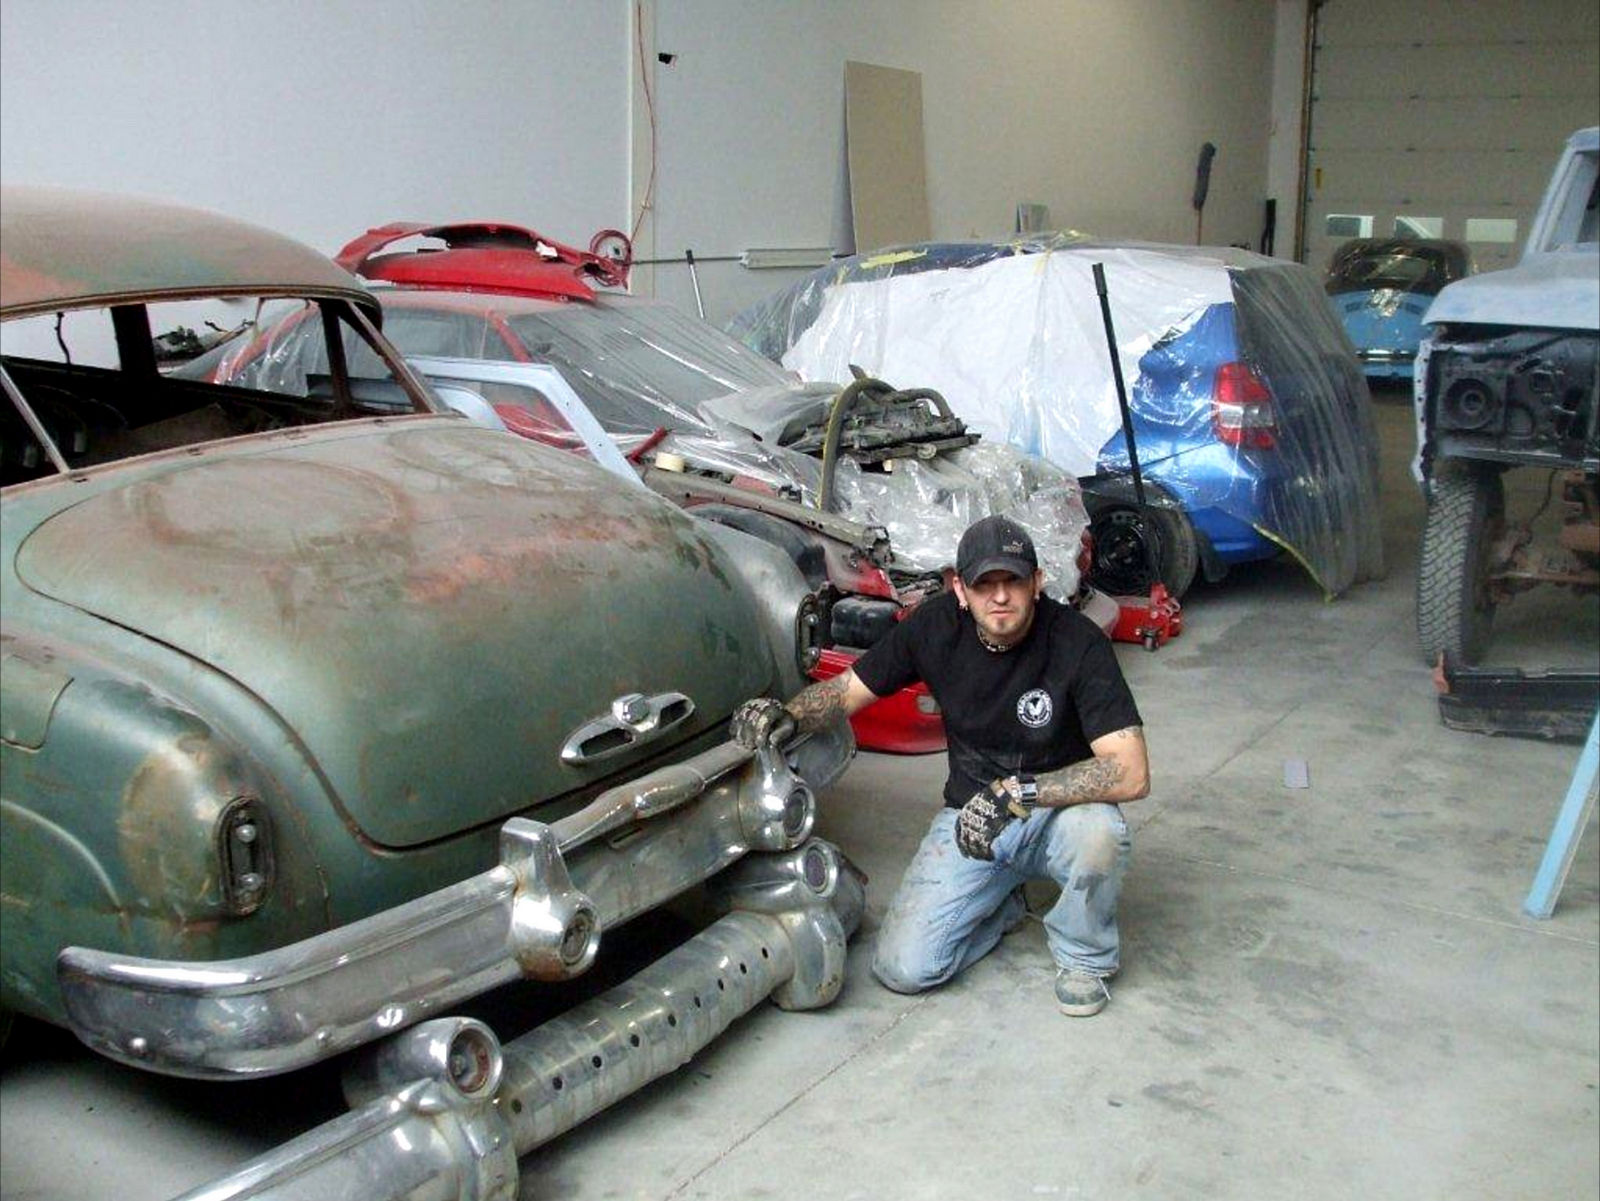 1950 Buick Dynaflow sedan